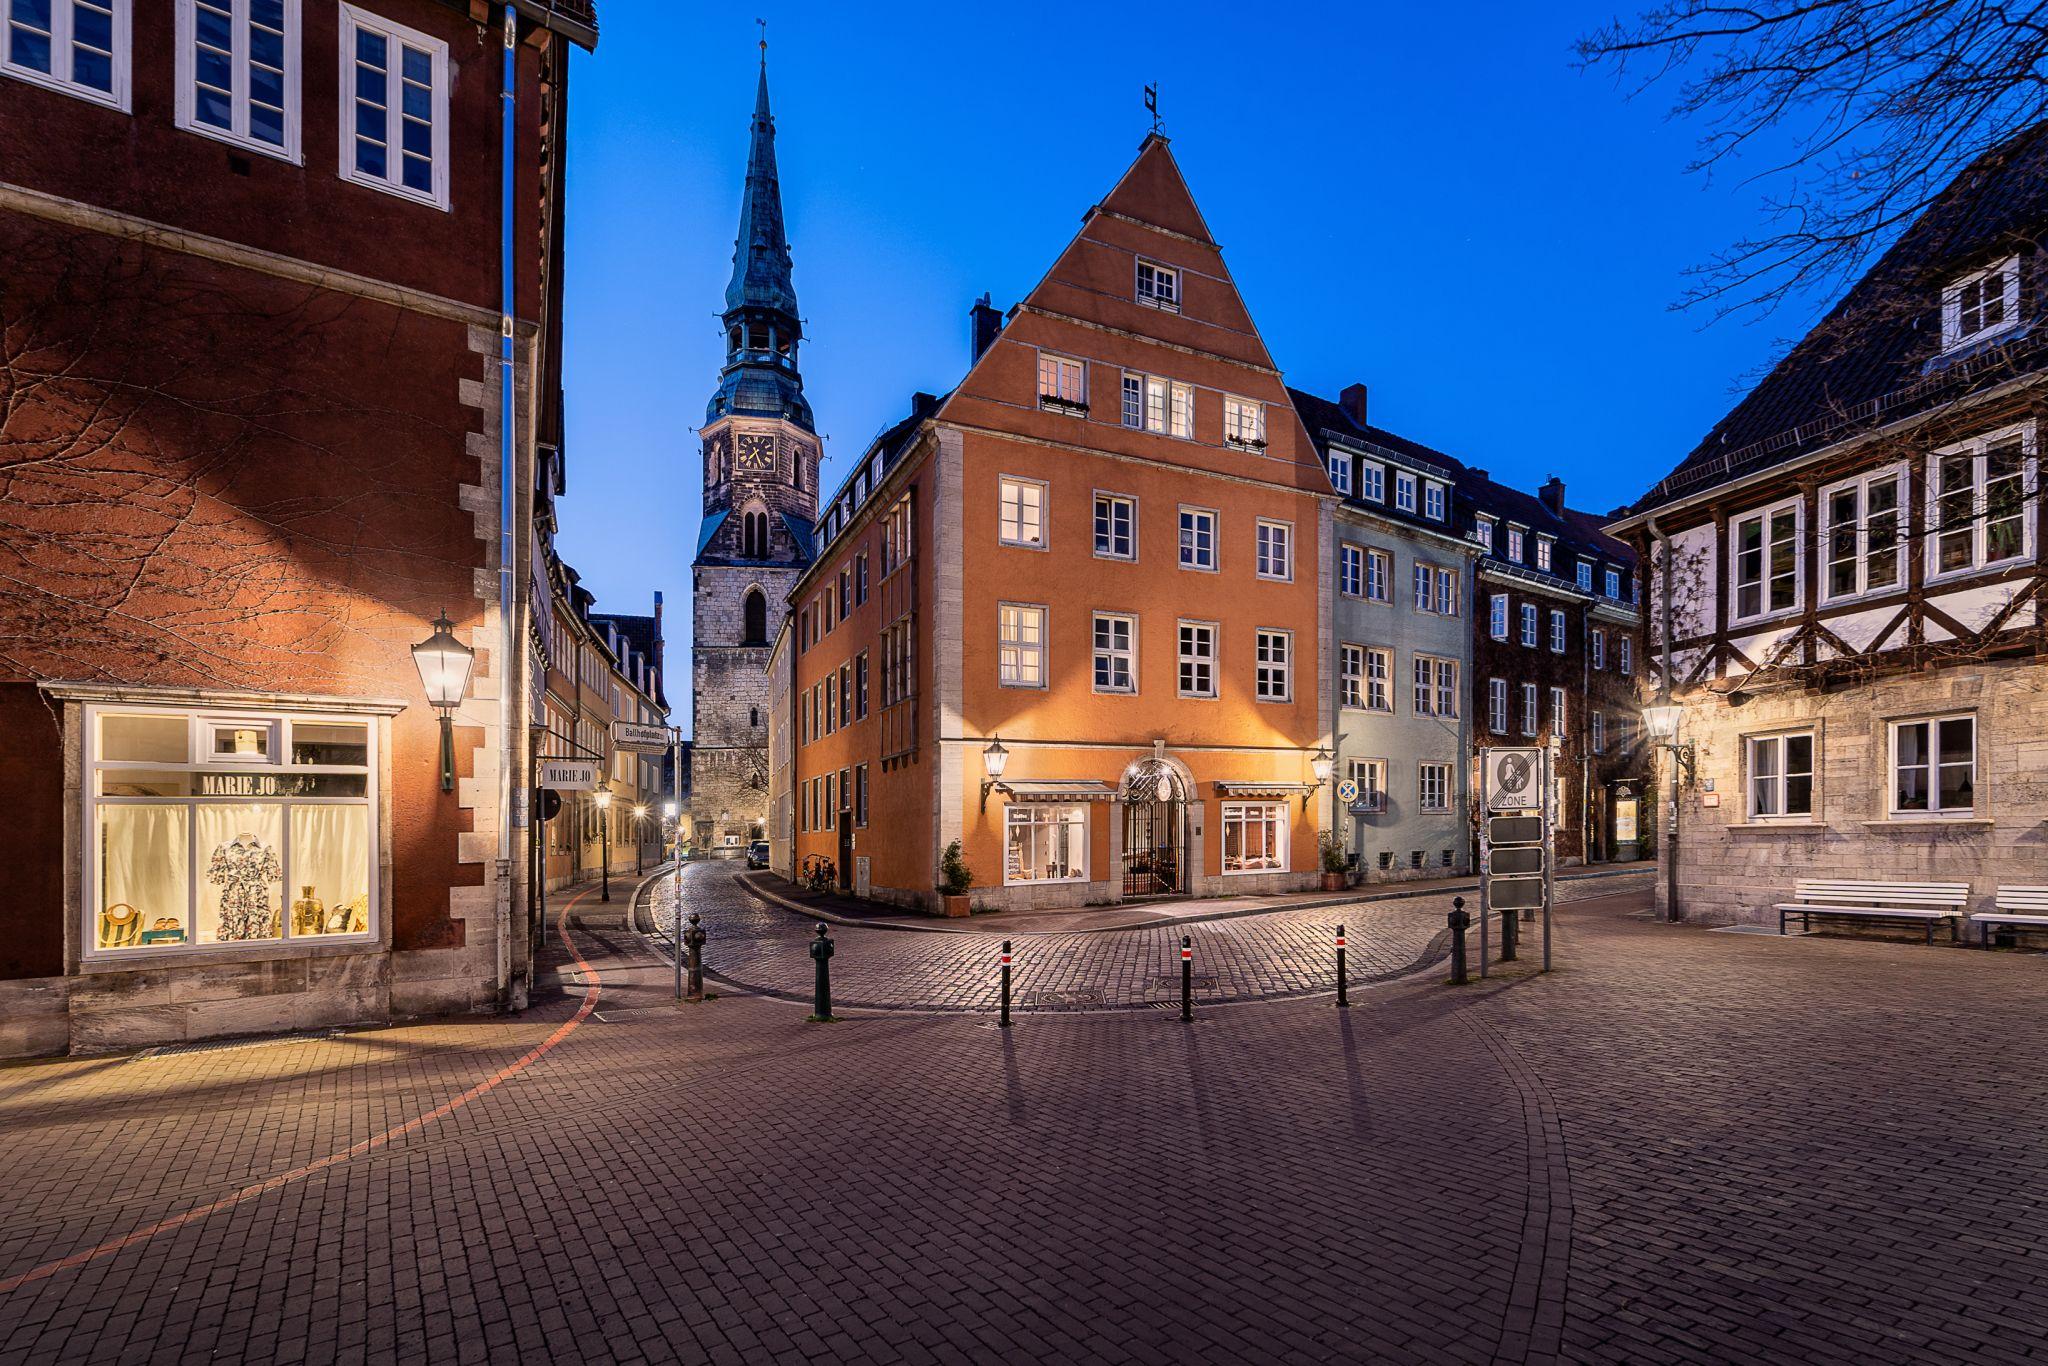 Ballhofplatz mit Kreuzkirche, Germany